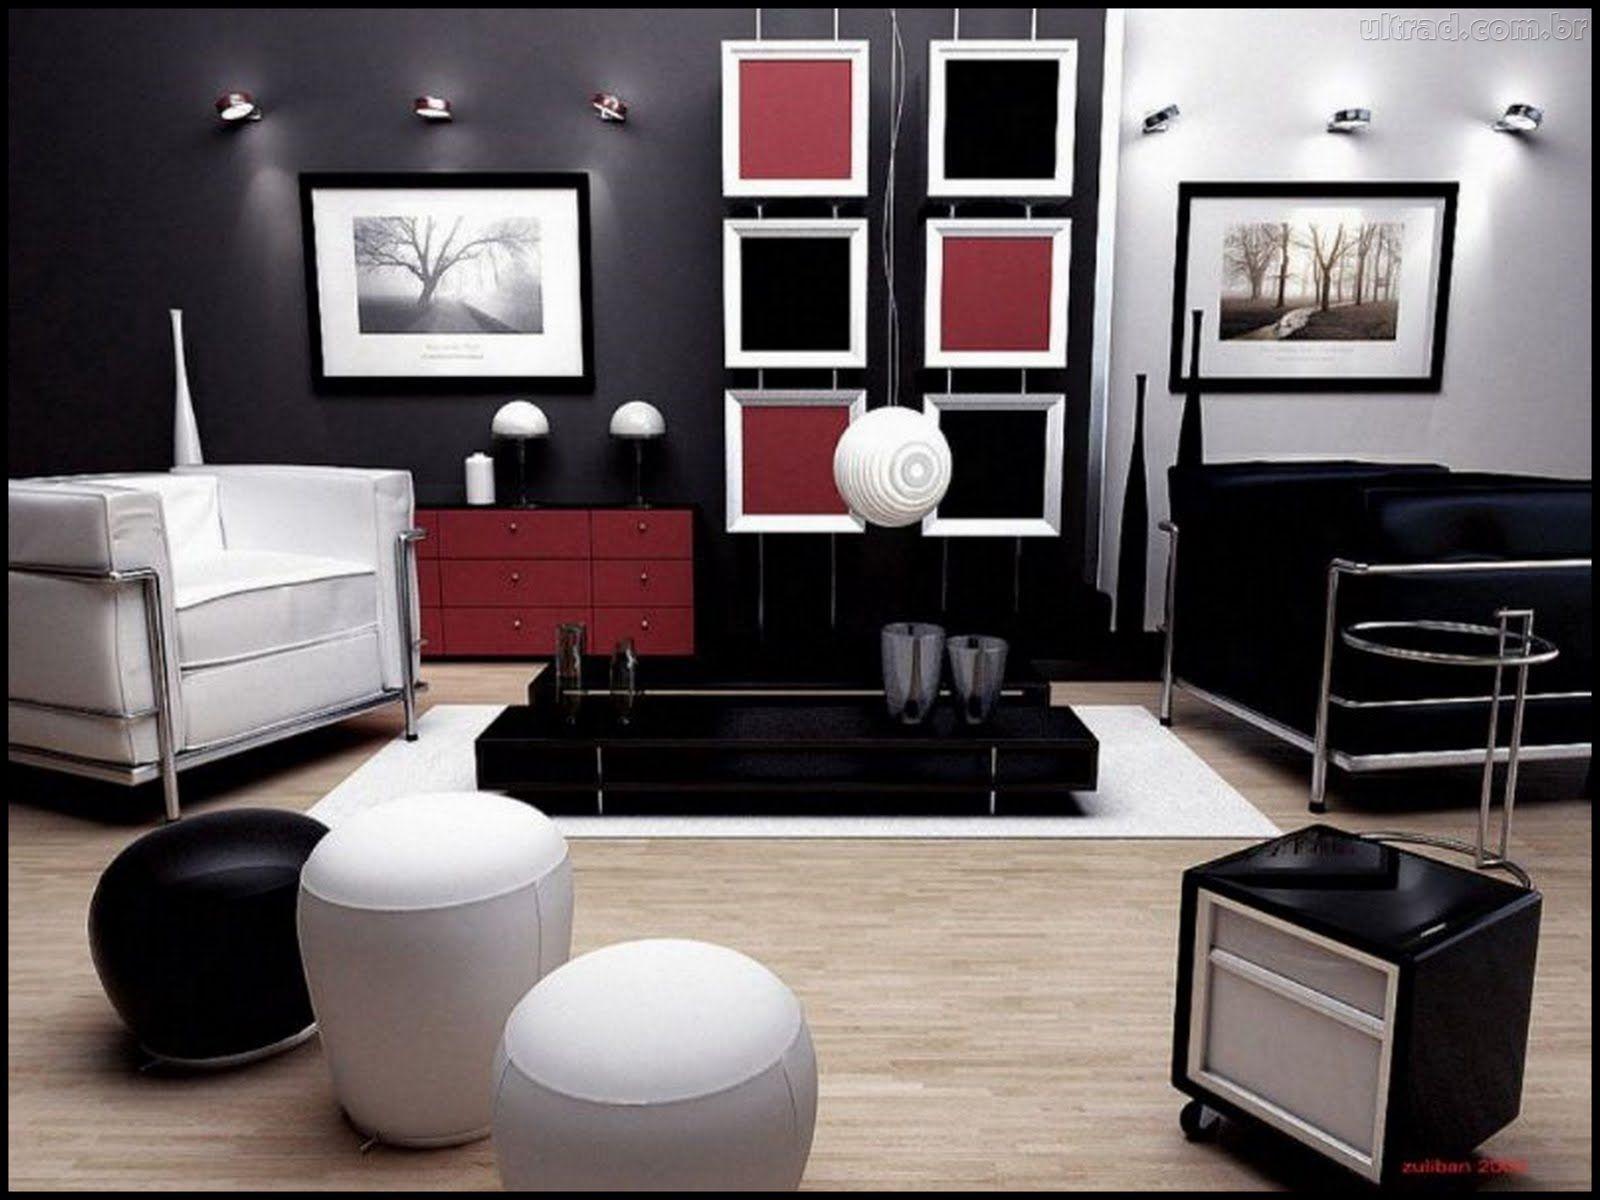 designer de interiores salas tv - Pesquisa Google | Designer de ...